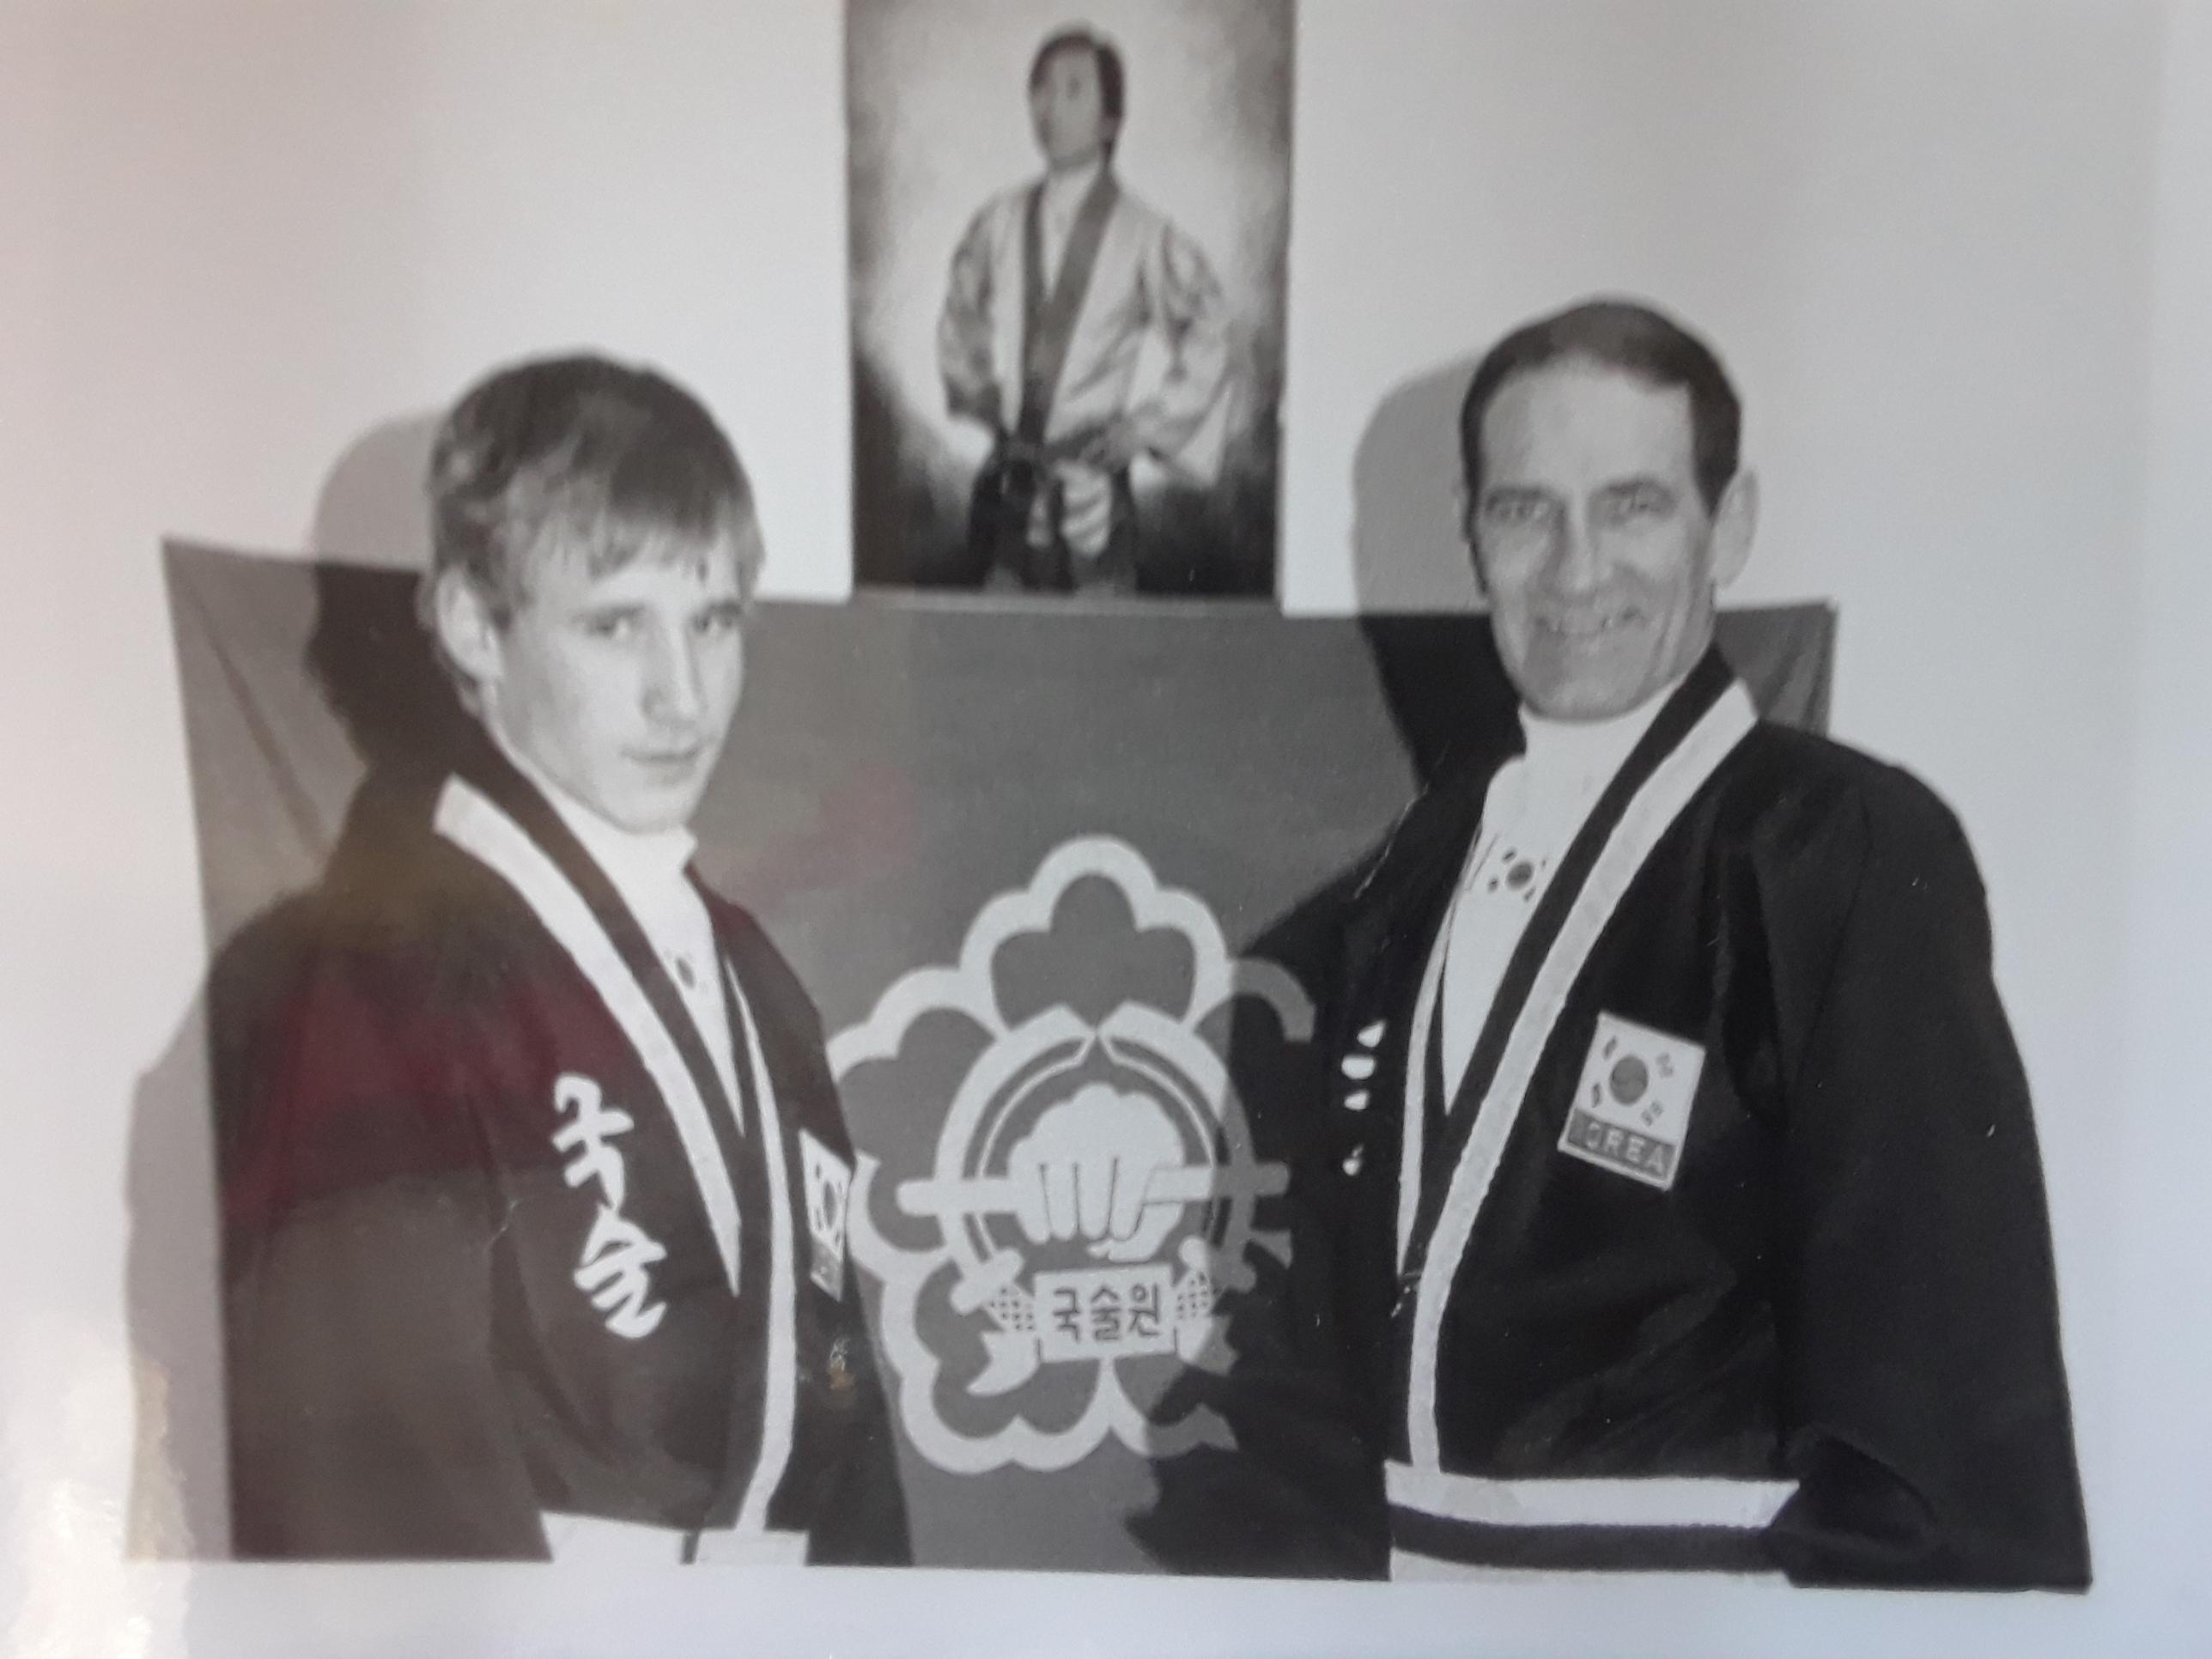 Normand et Christian Laroque 1992 kuk sool won